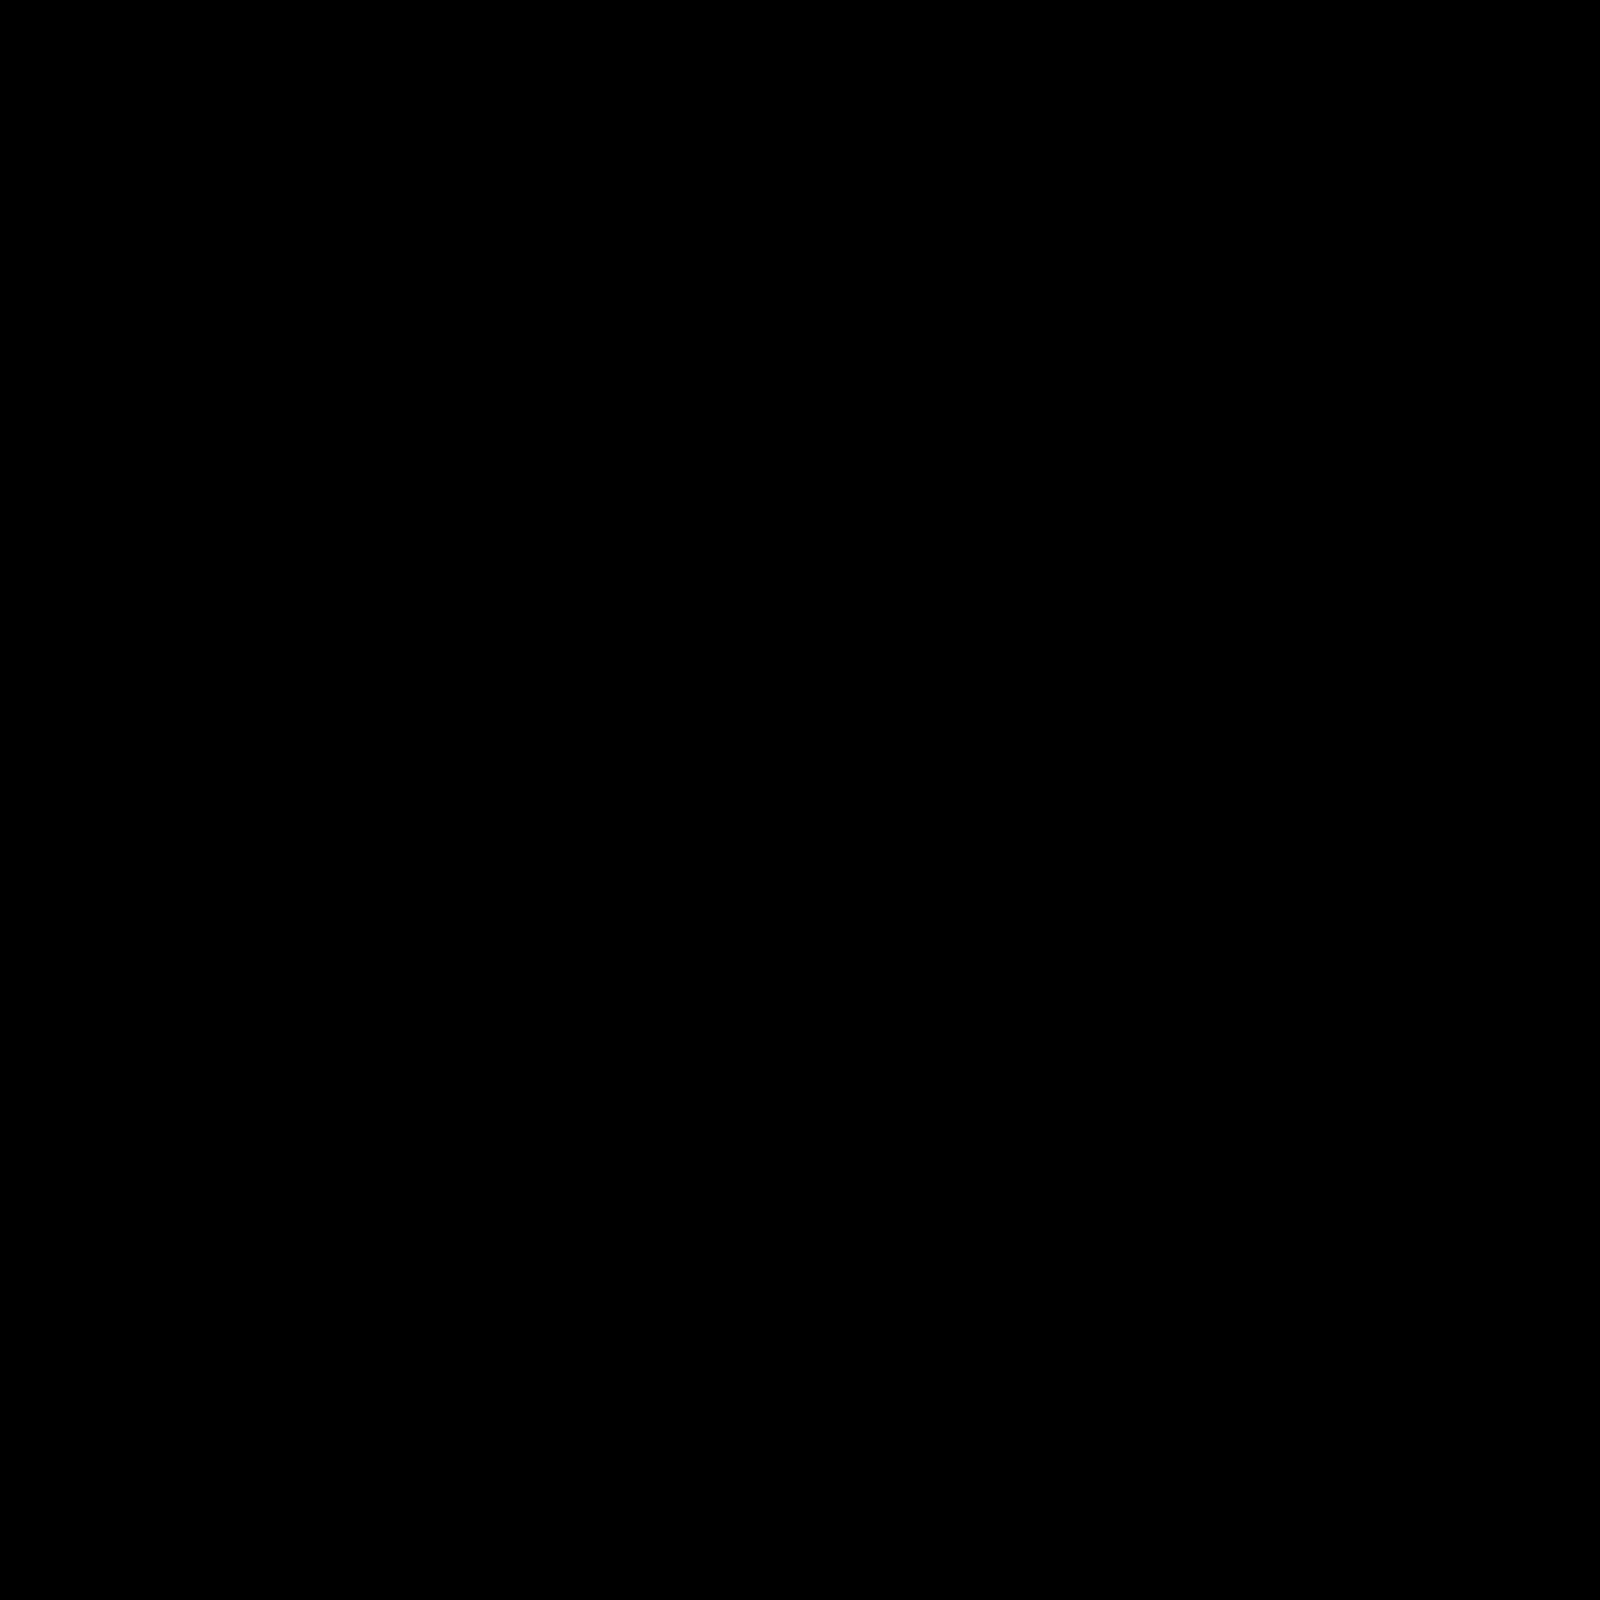 svg freeuse stock Drawing lambo. Lamborghini logo pinterest.